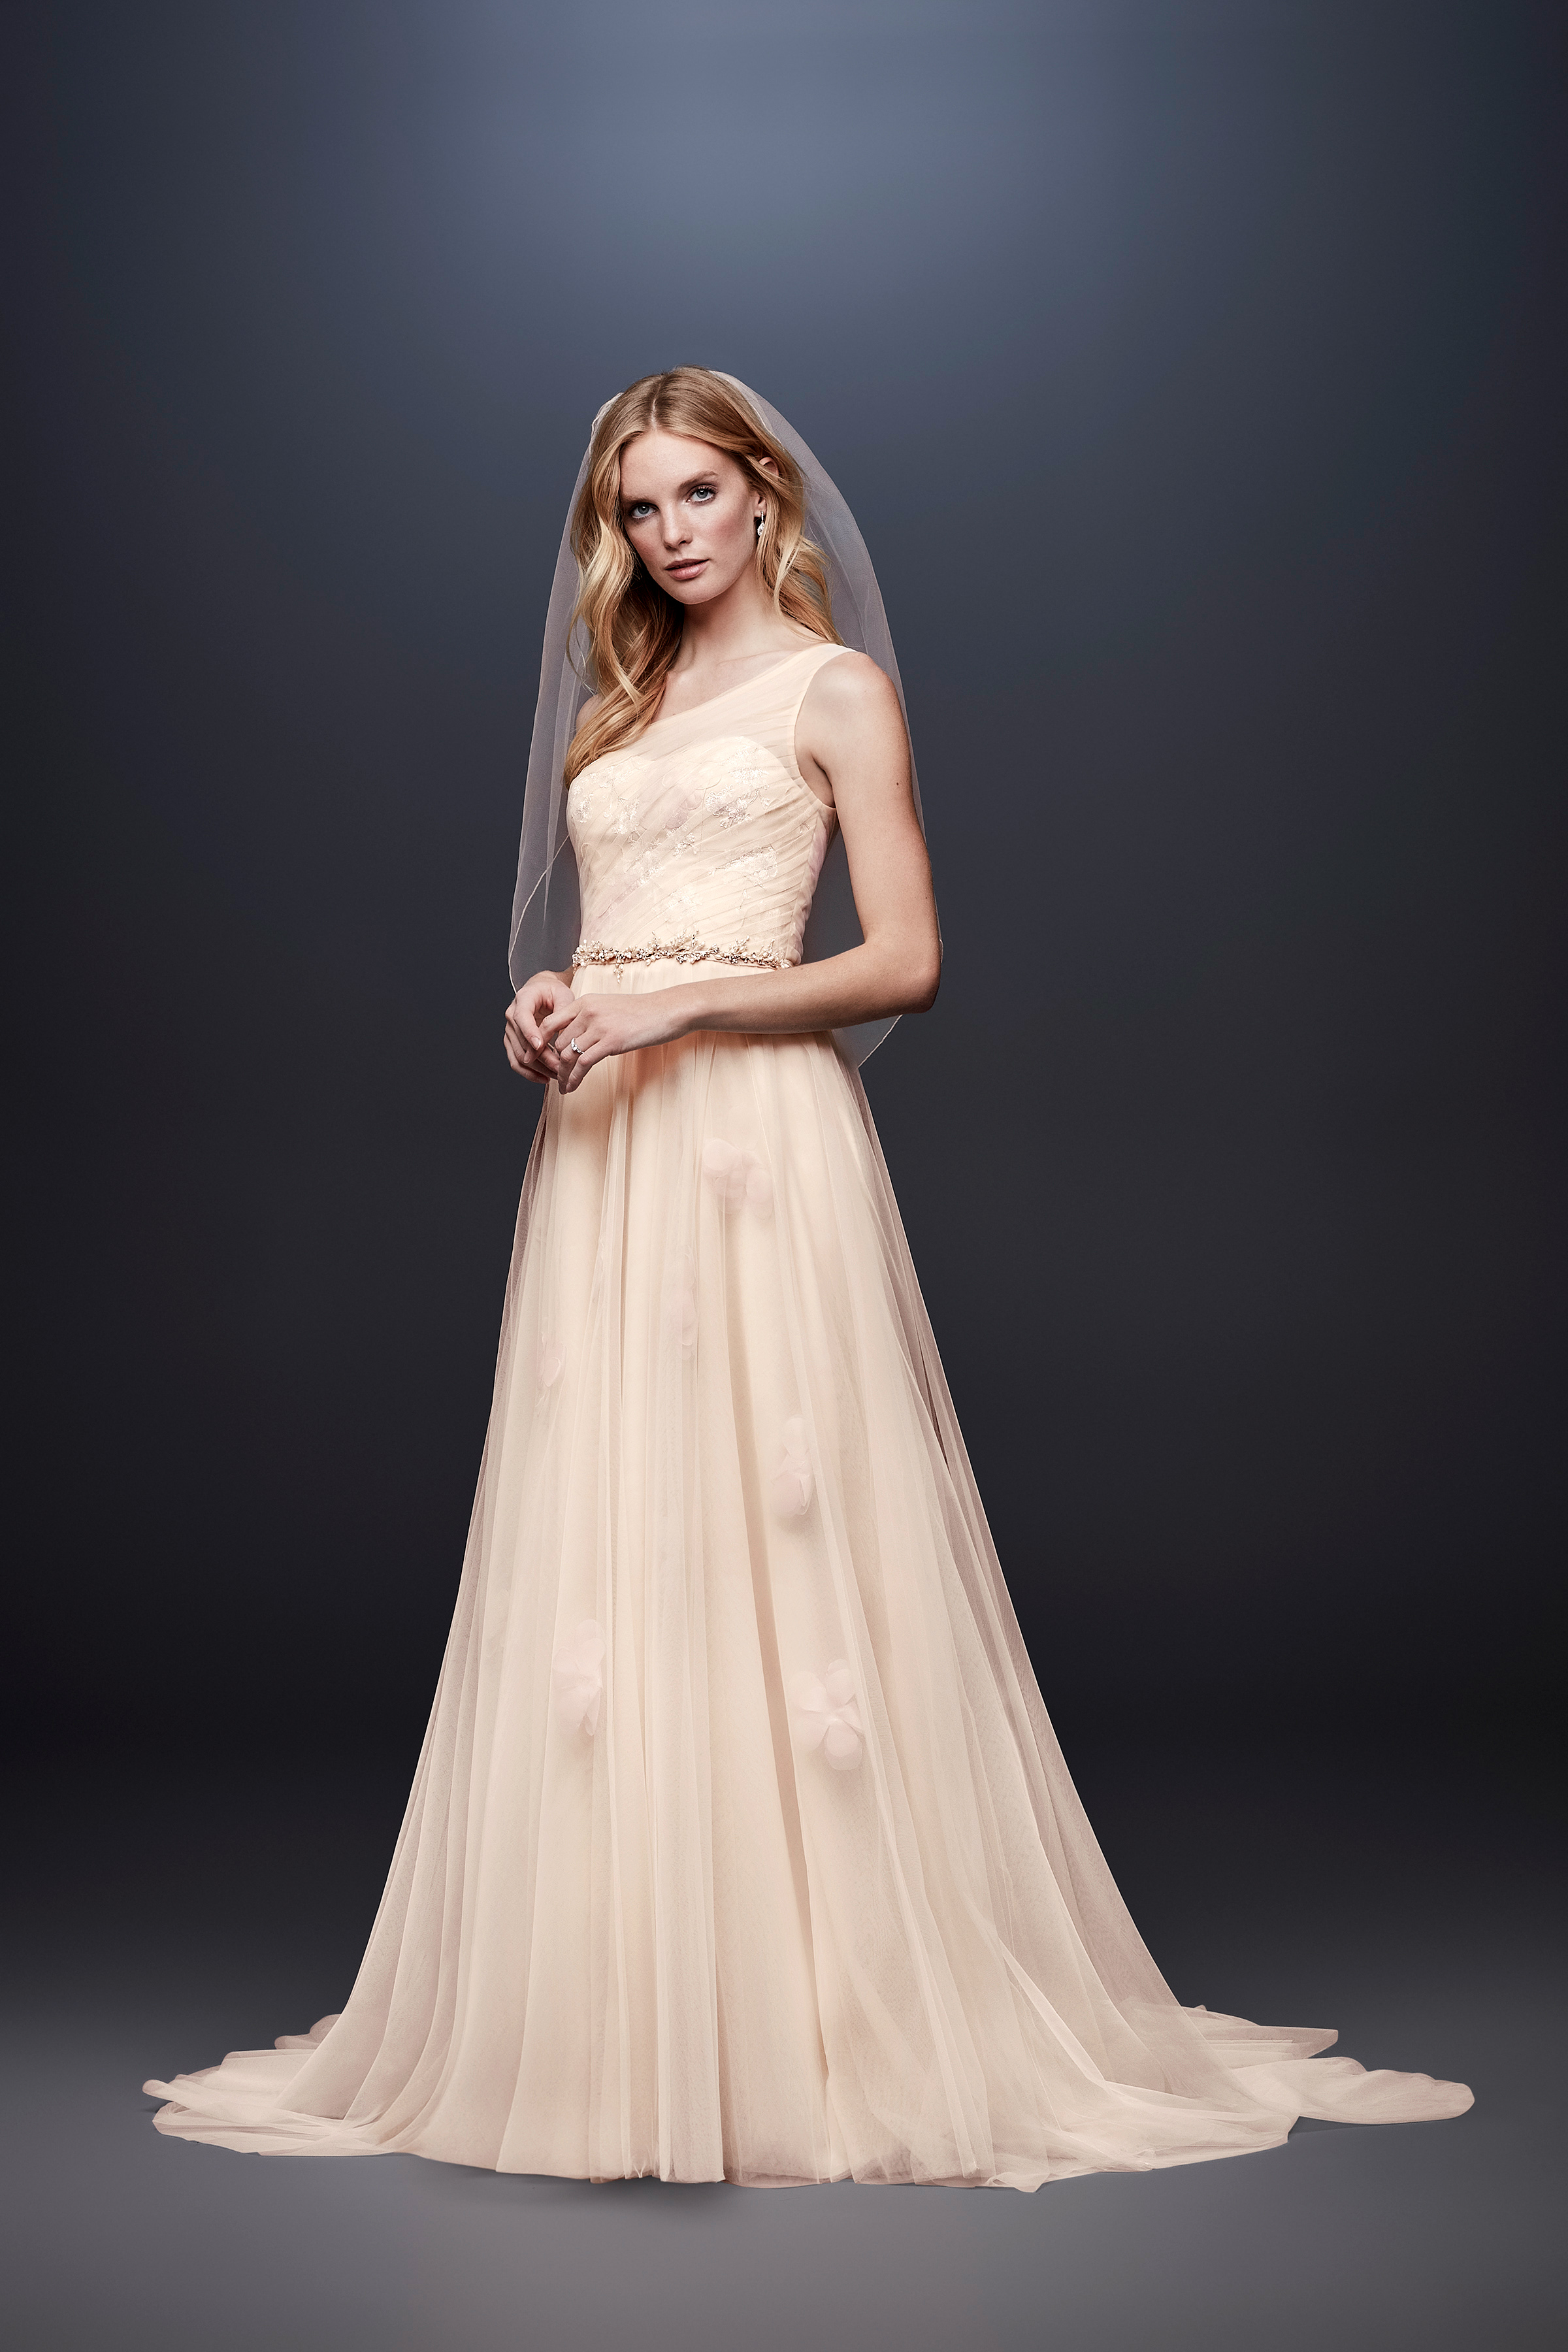 david bridal wedding dress spring 2019 a-line peach one shoulder belt